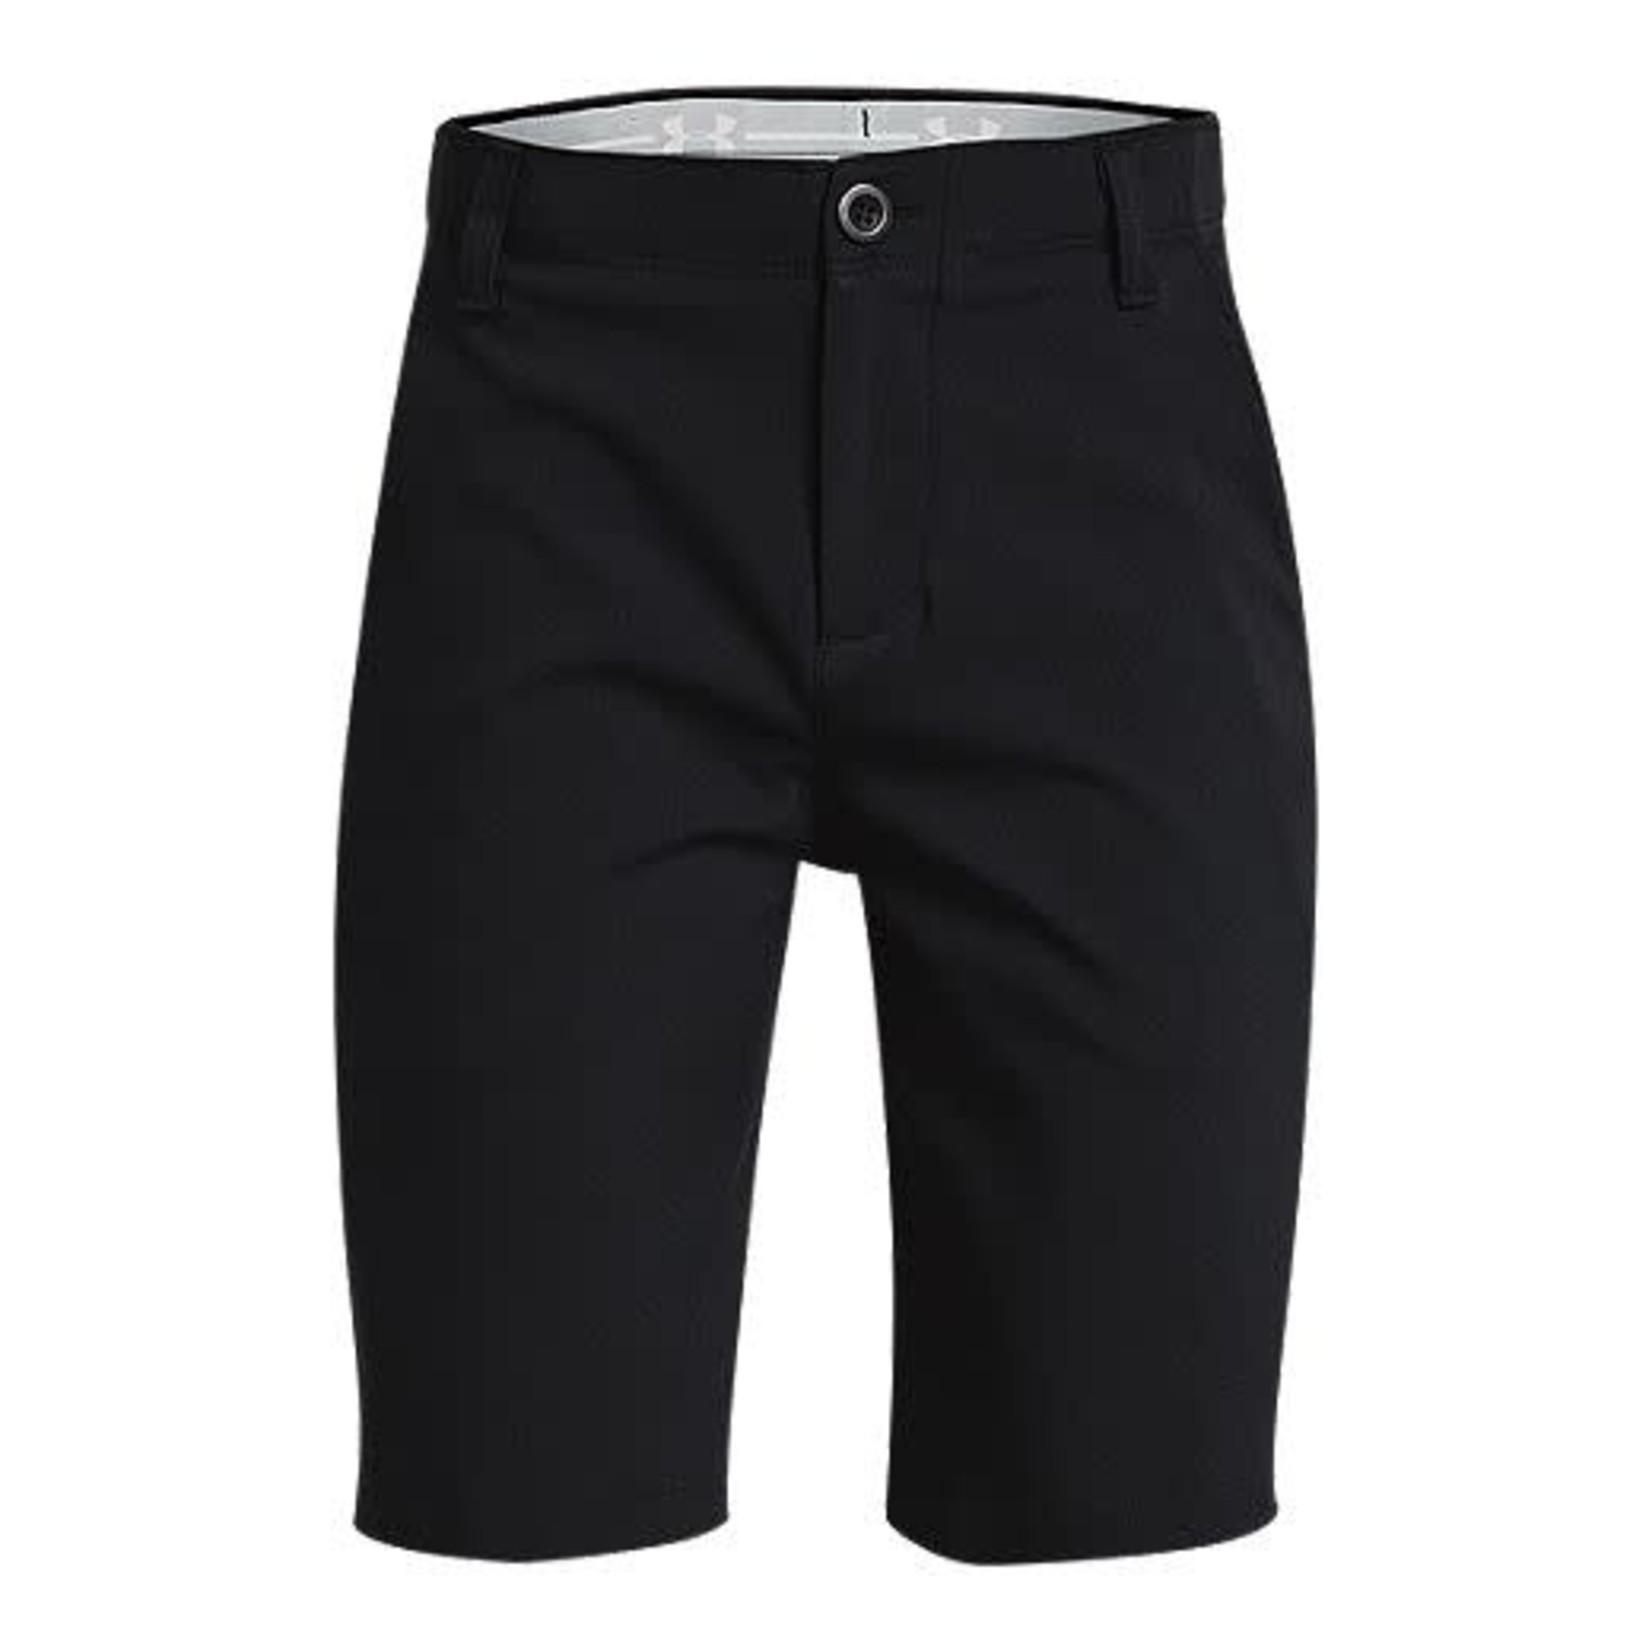 Under Armour Under Armour Golf Shorts, Showdown, Boys